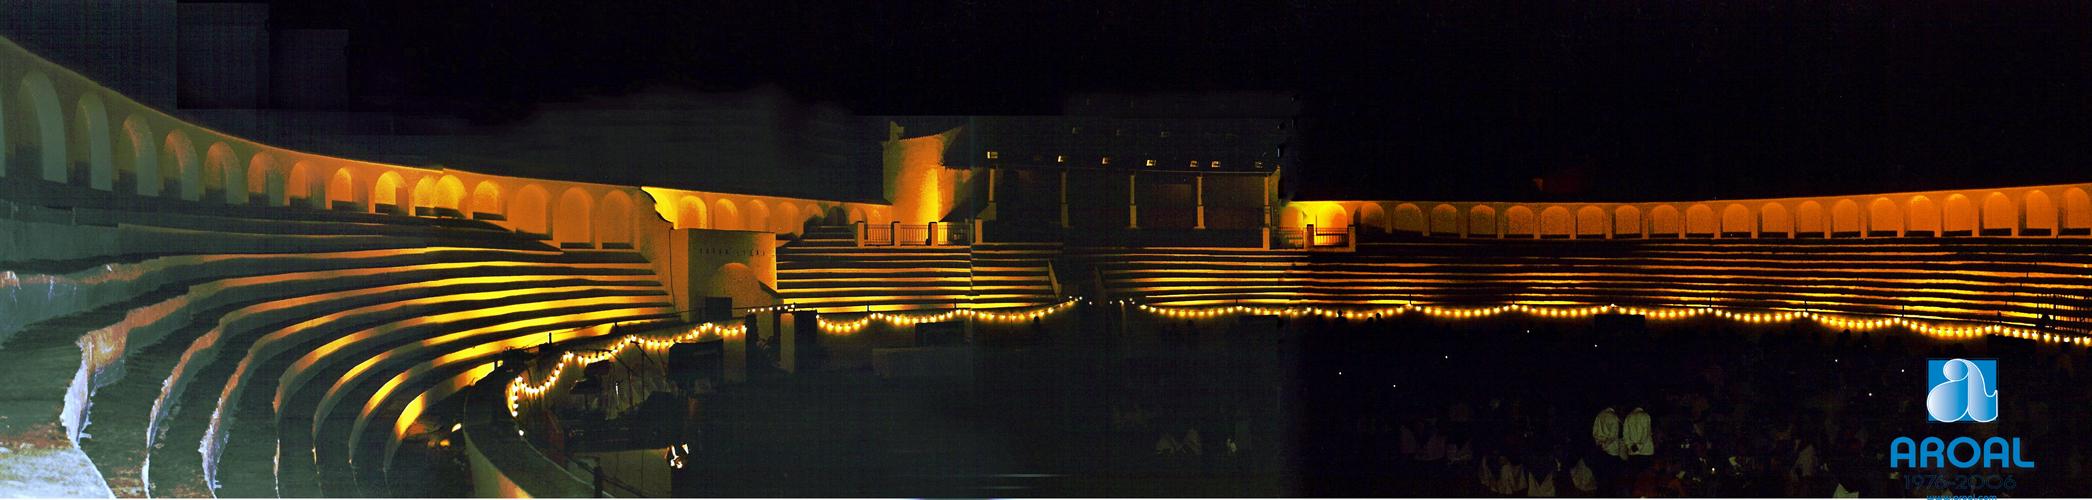 Plaza de Toros iluminada. Valverde del Camino